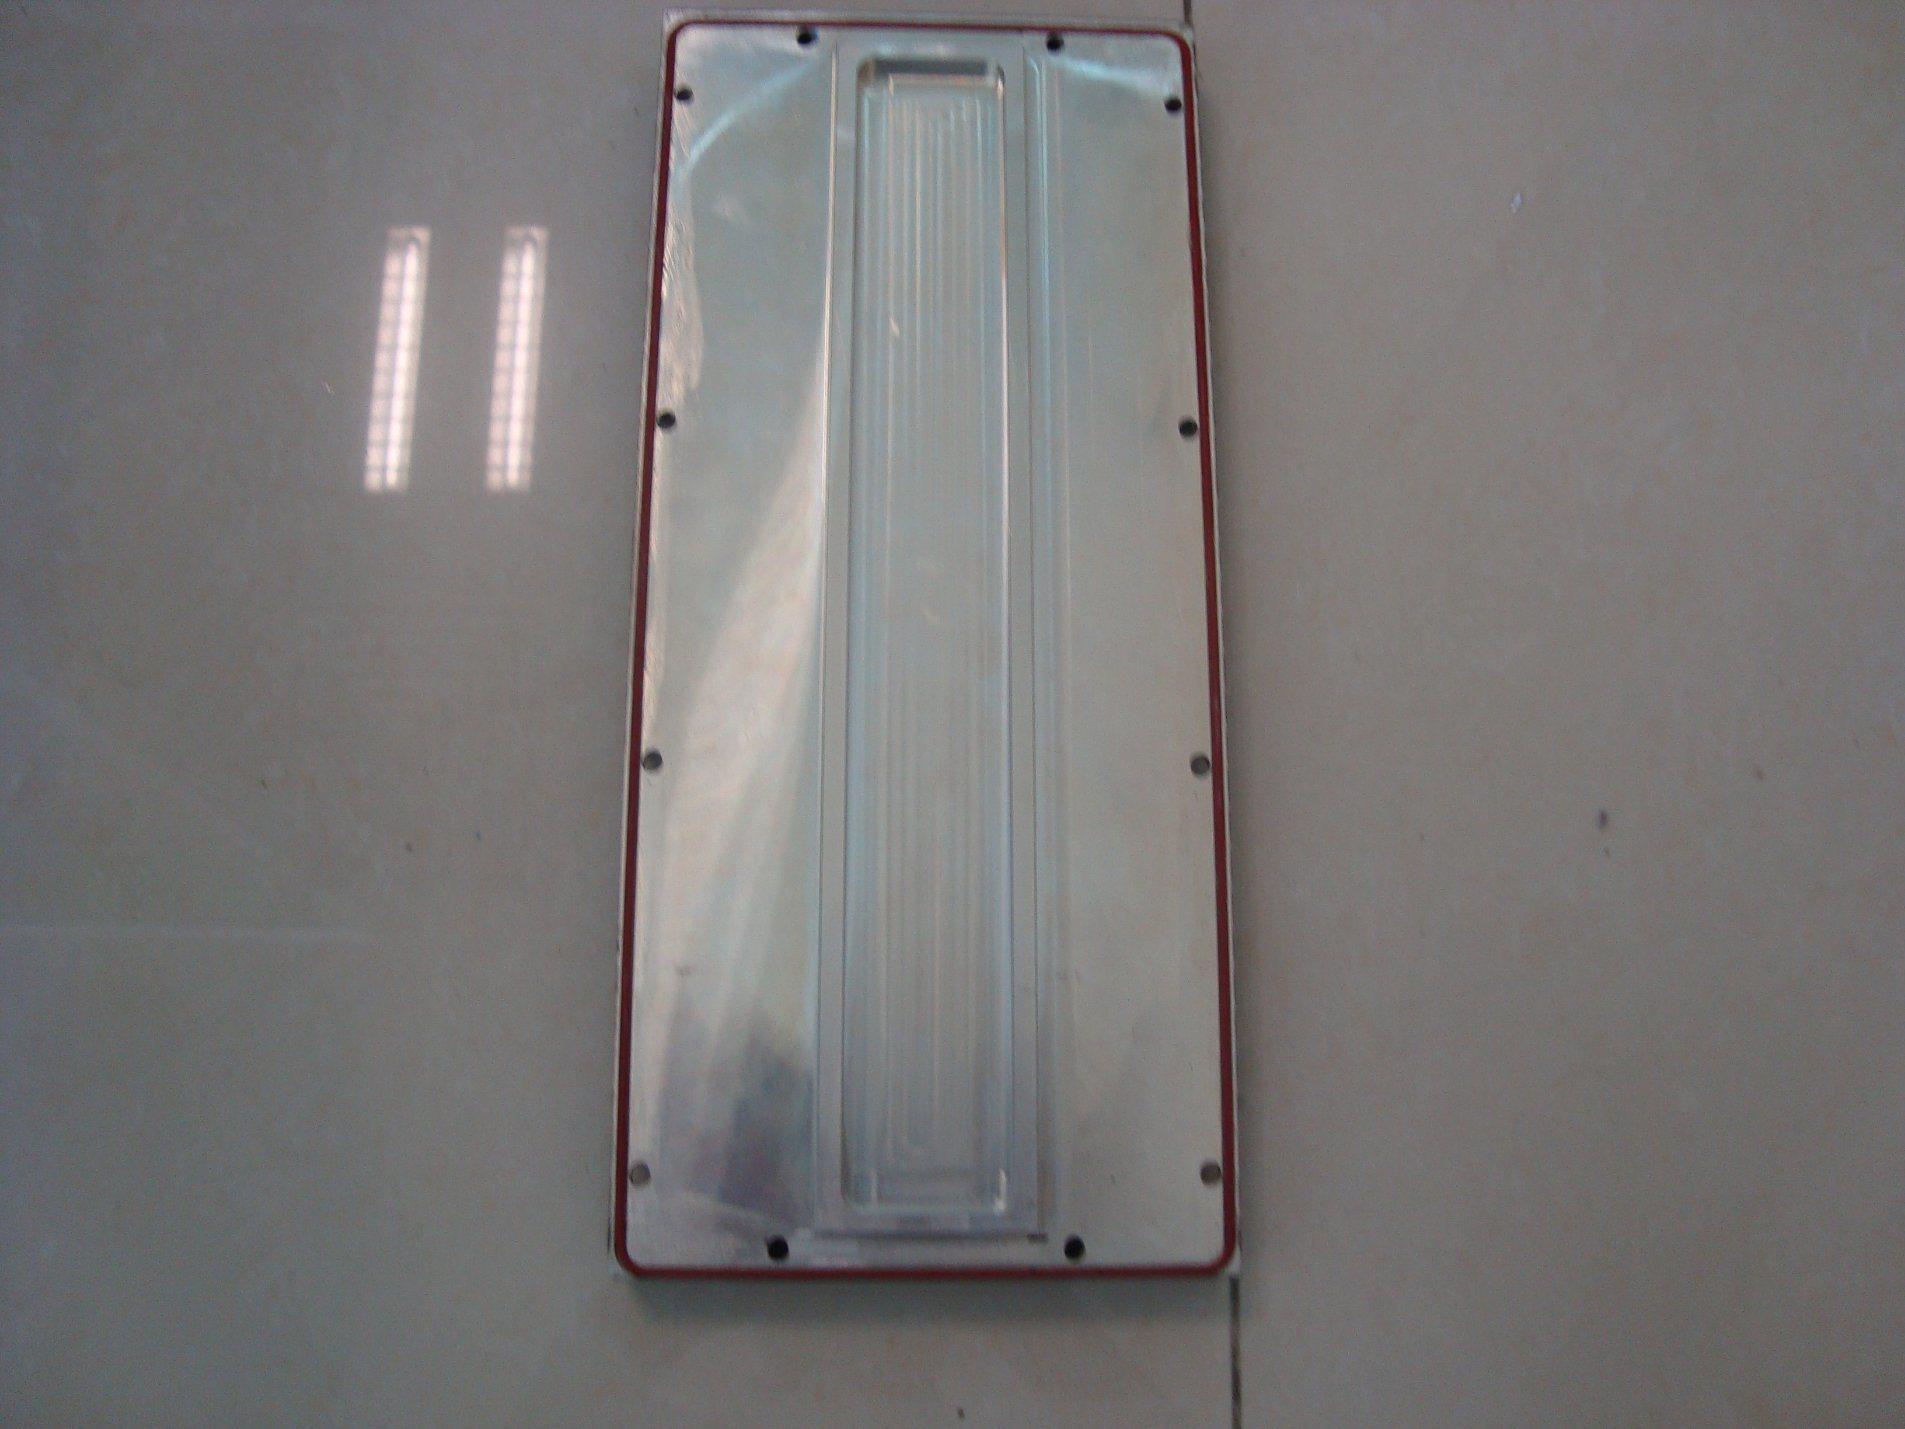 Aluminium Heat Sink for Vidio with Precise CNC Machining Jobs